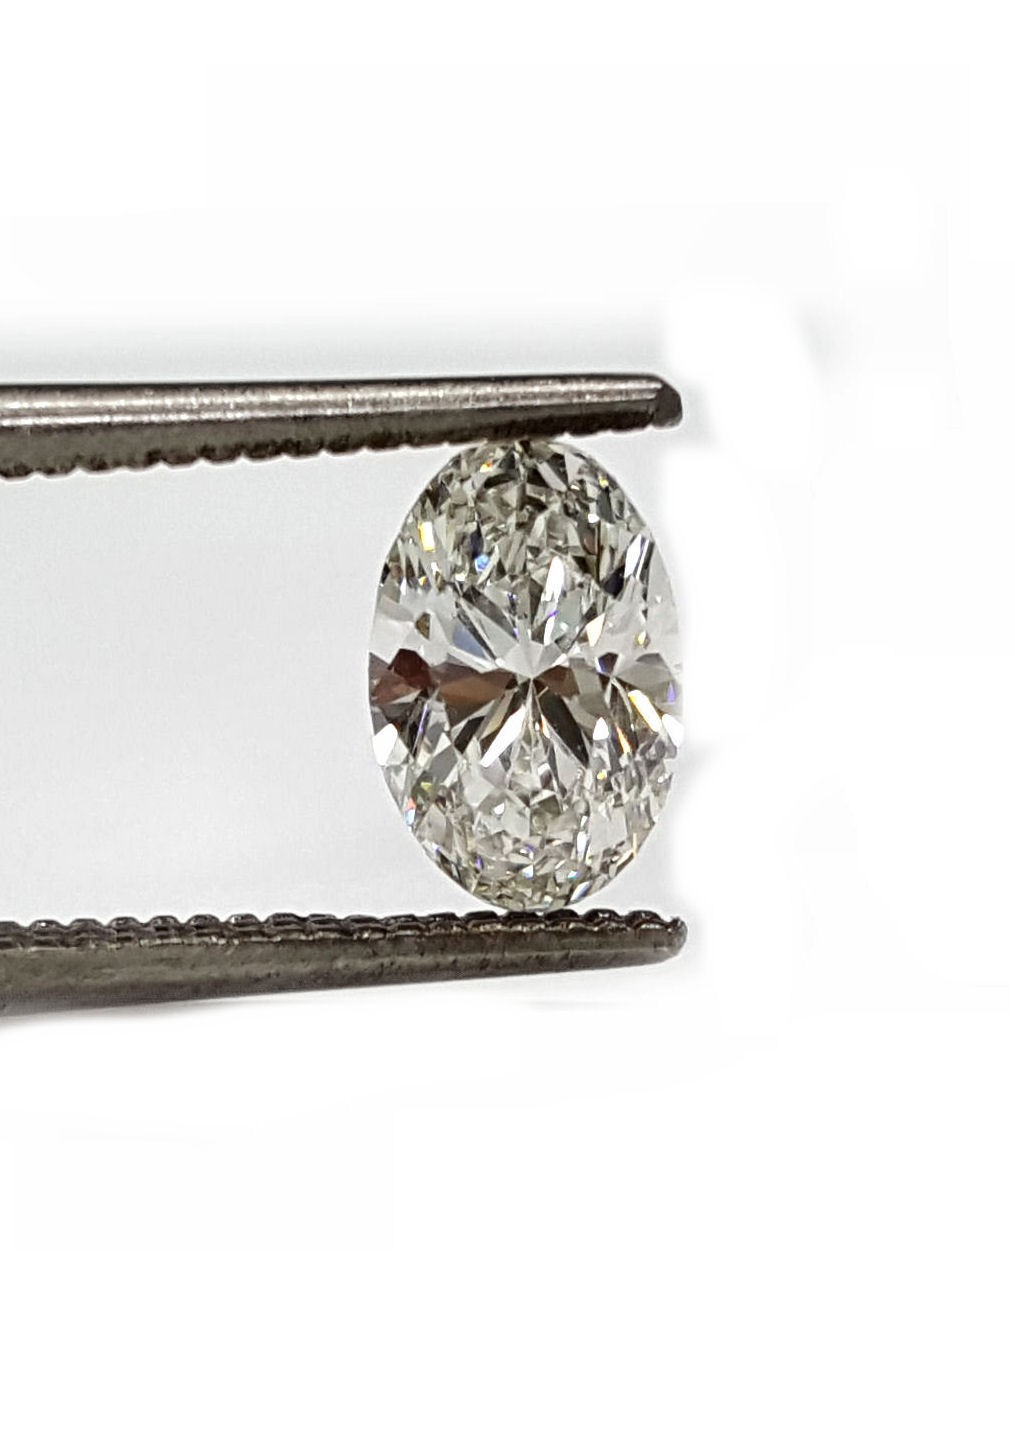 Oval diamond 74pts. K VS2 quality